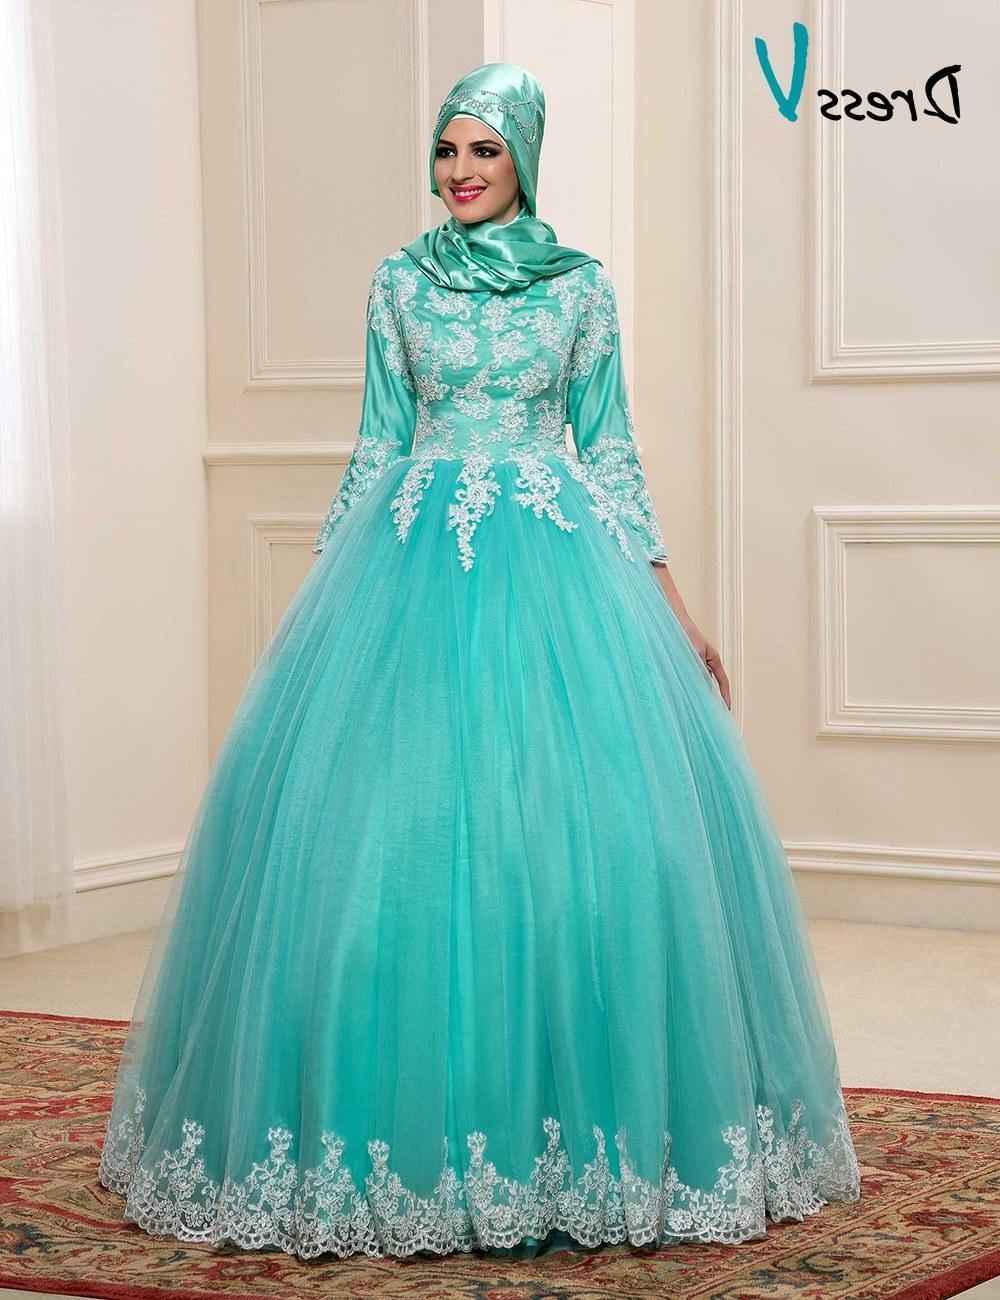 Ide Baju Pengantin Muslimah Modern Bqdd islamic Hijab Wedding Dresses – Fashion Dresses